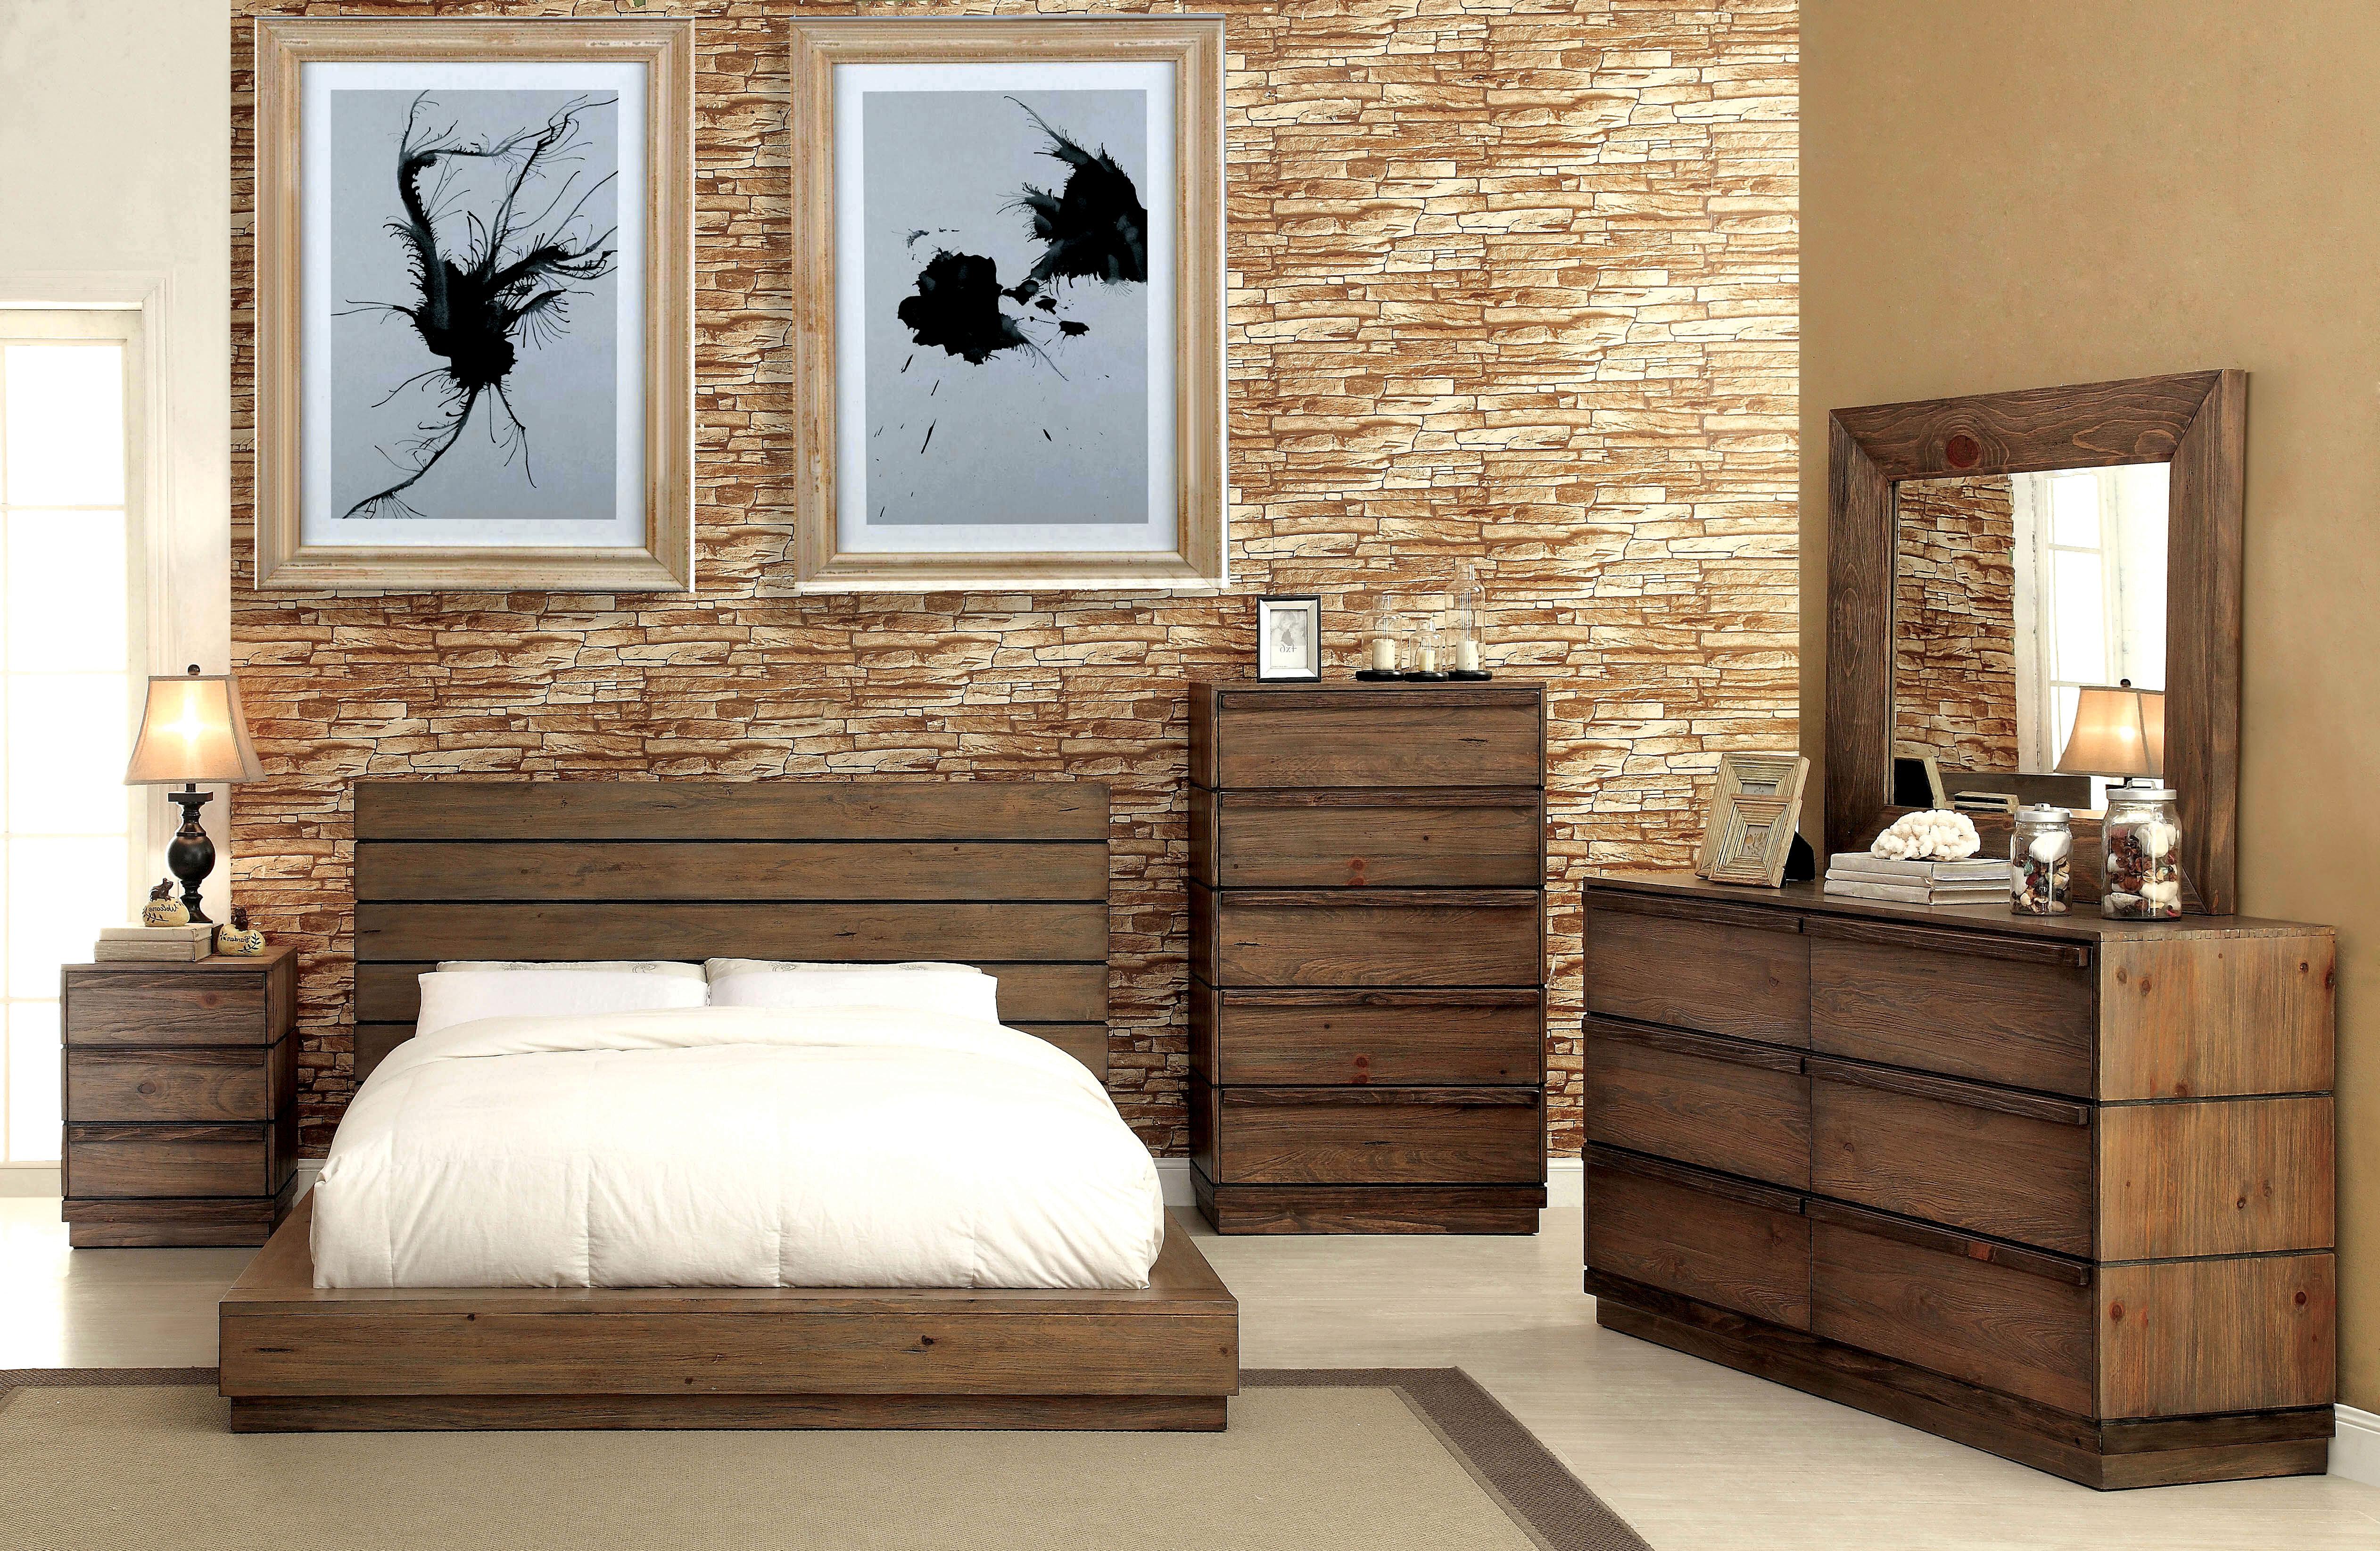 at bed price set online mangano buy best room sohomod bedroom